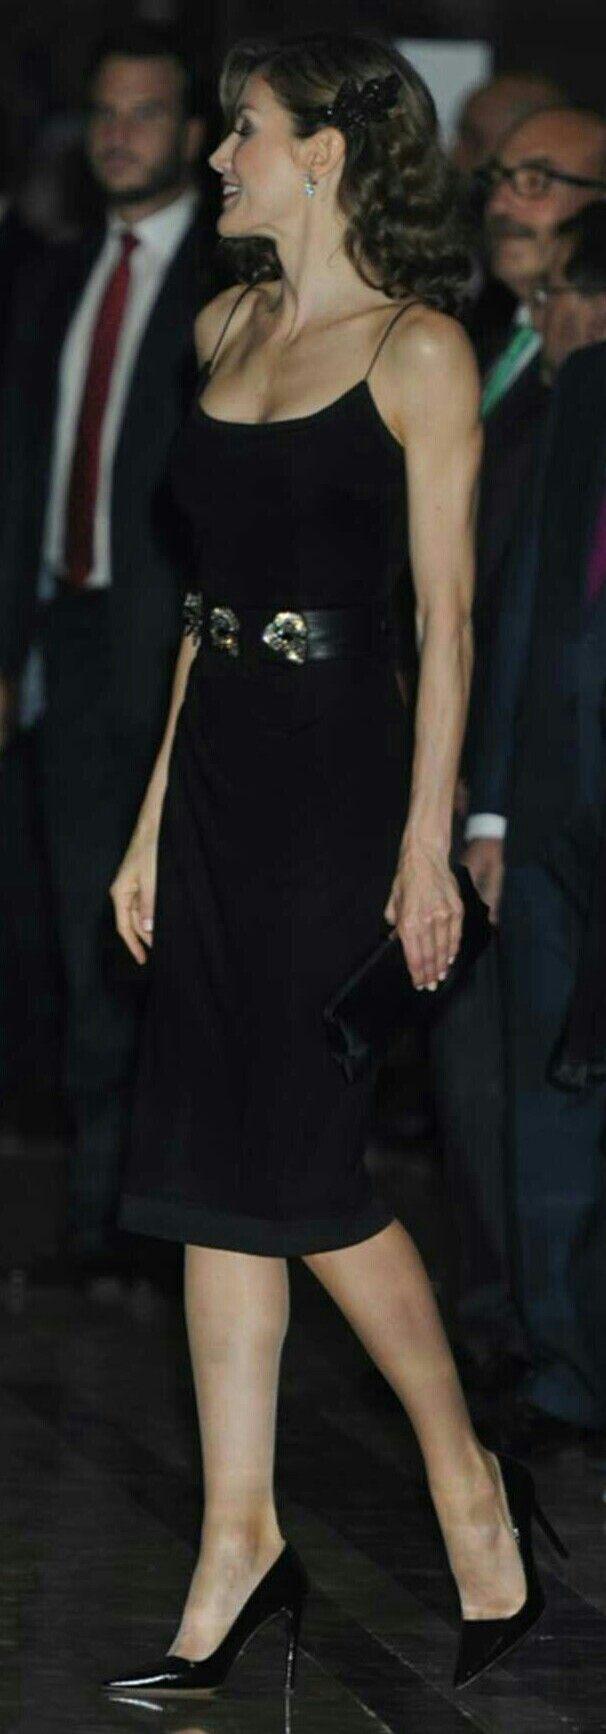 Queen Letizia in Felipe Varela. Concert in Oviedo. Premios Princesa. Night style.